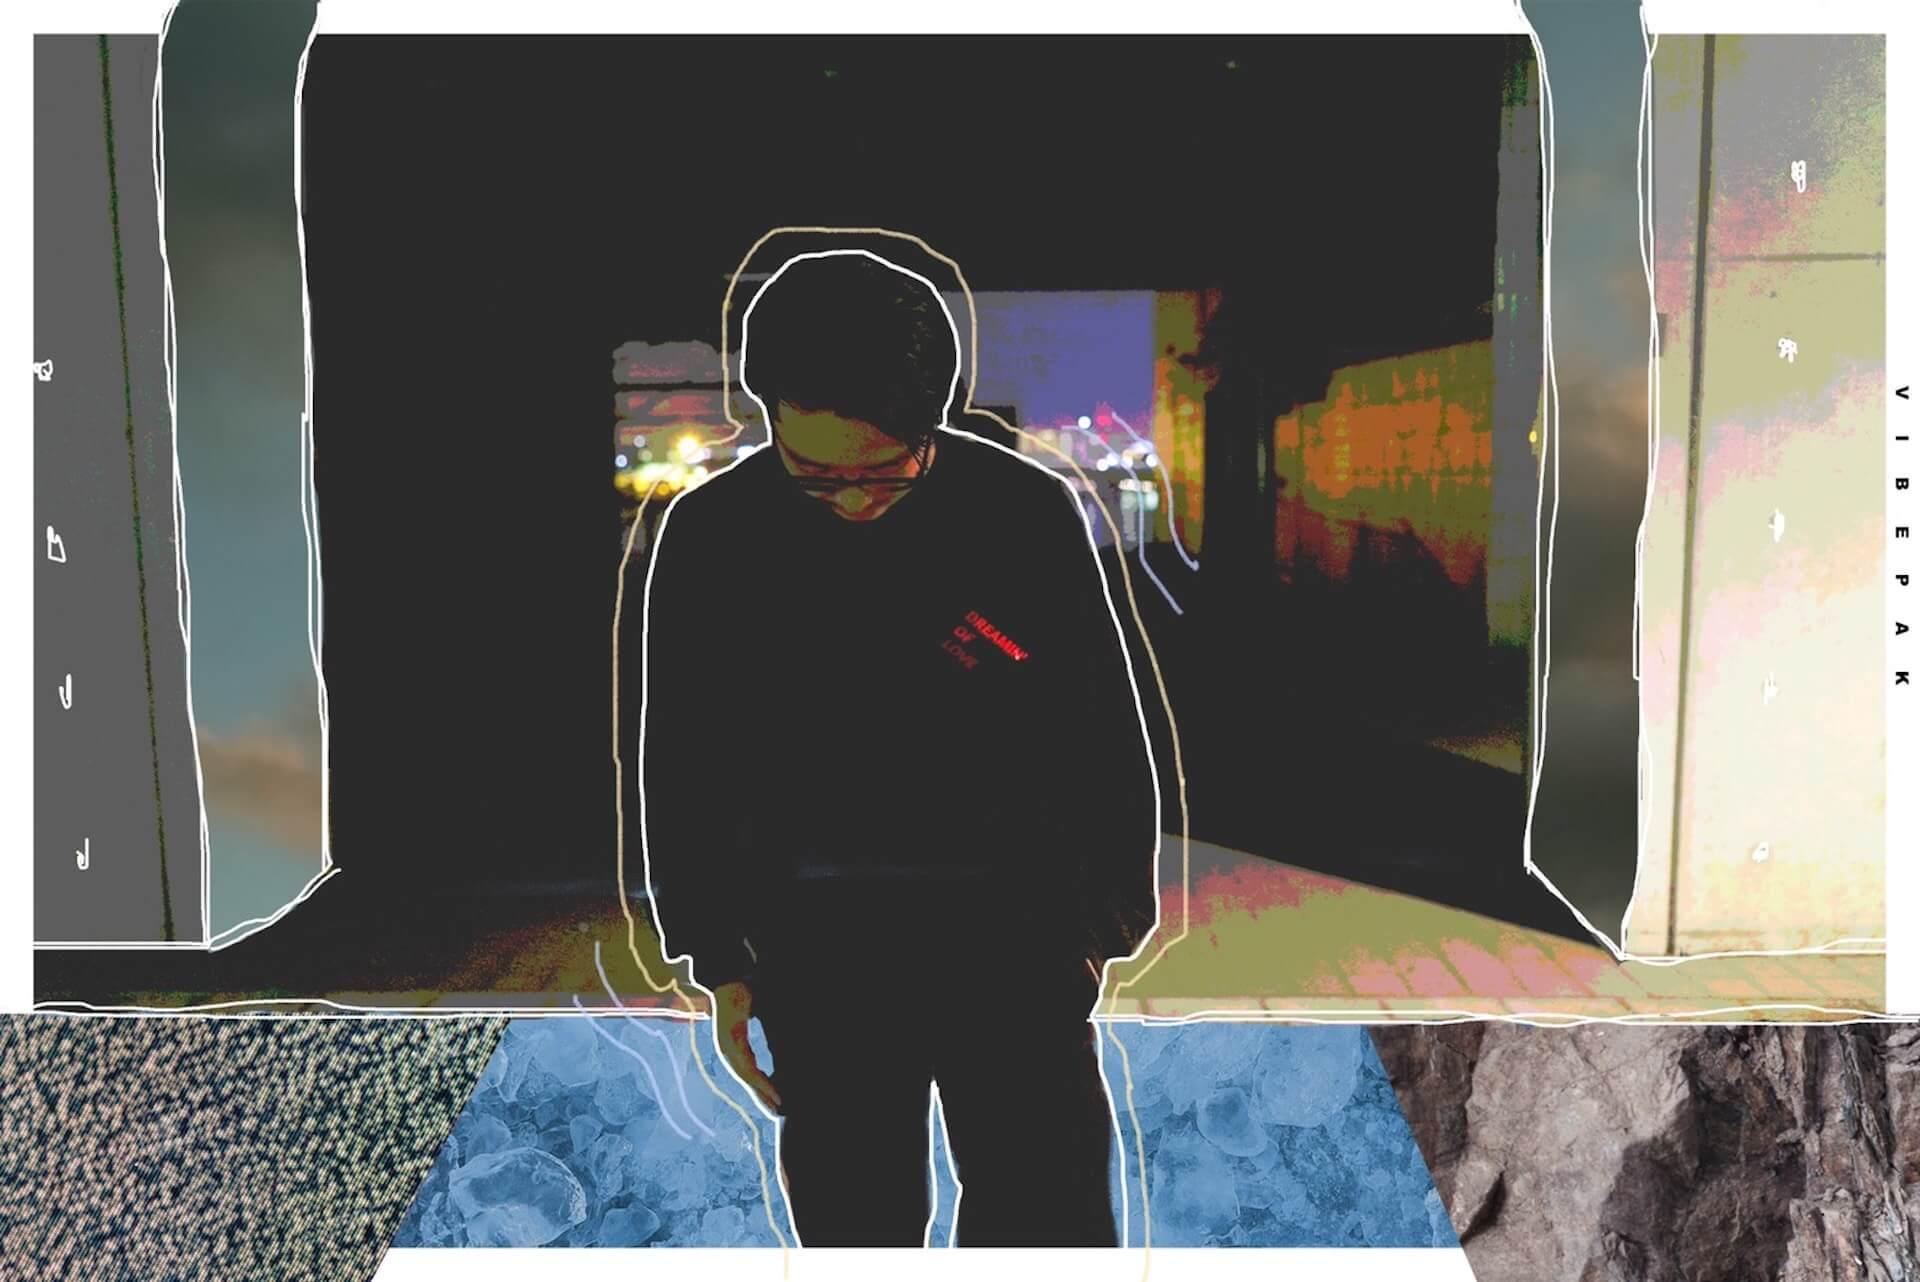 SoulflexメンバーZINとFKDがMusiq Soulchildのカバーソングをフリーダウンロードリリース! music200414_zin_fkd_01